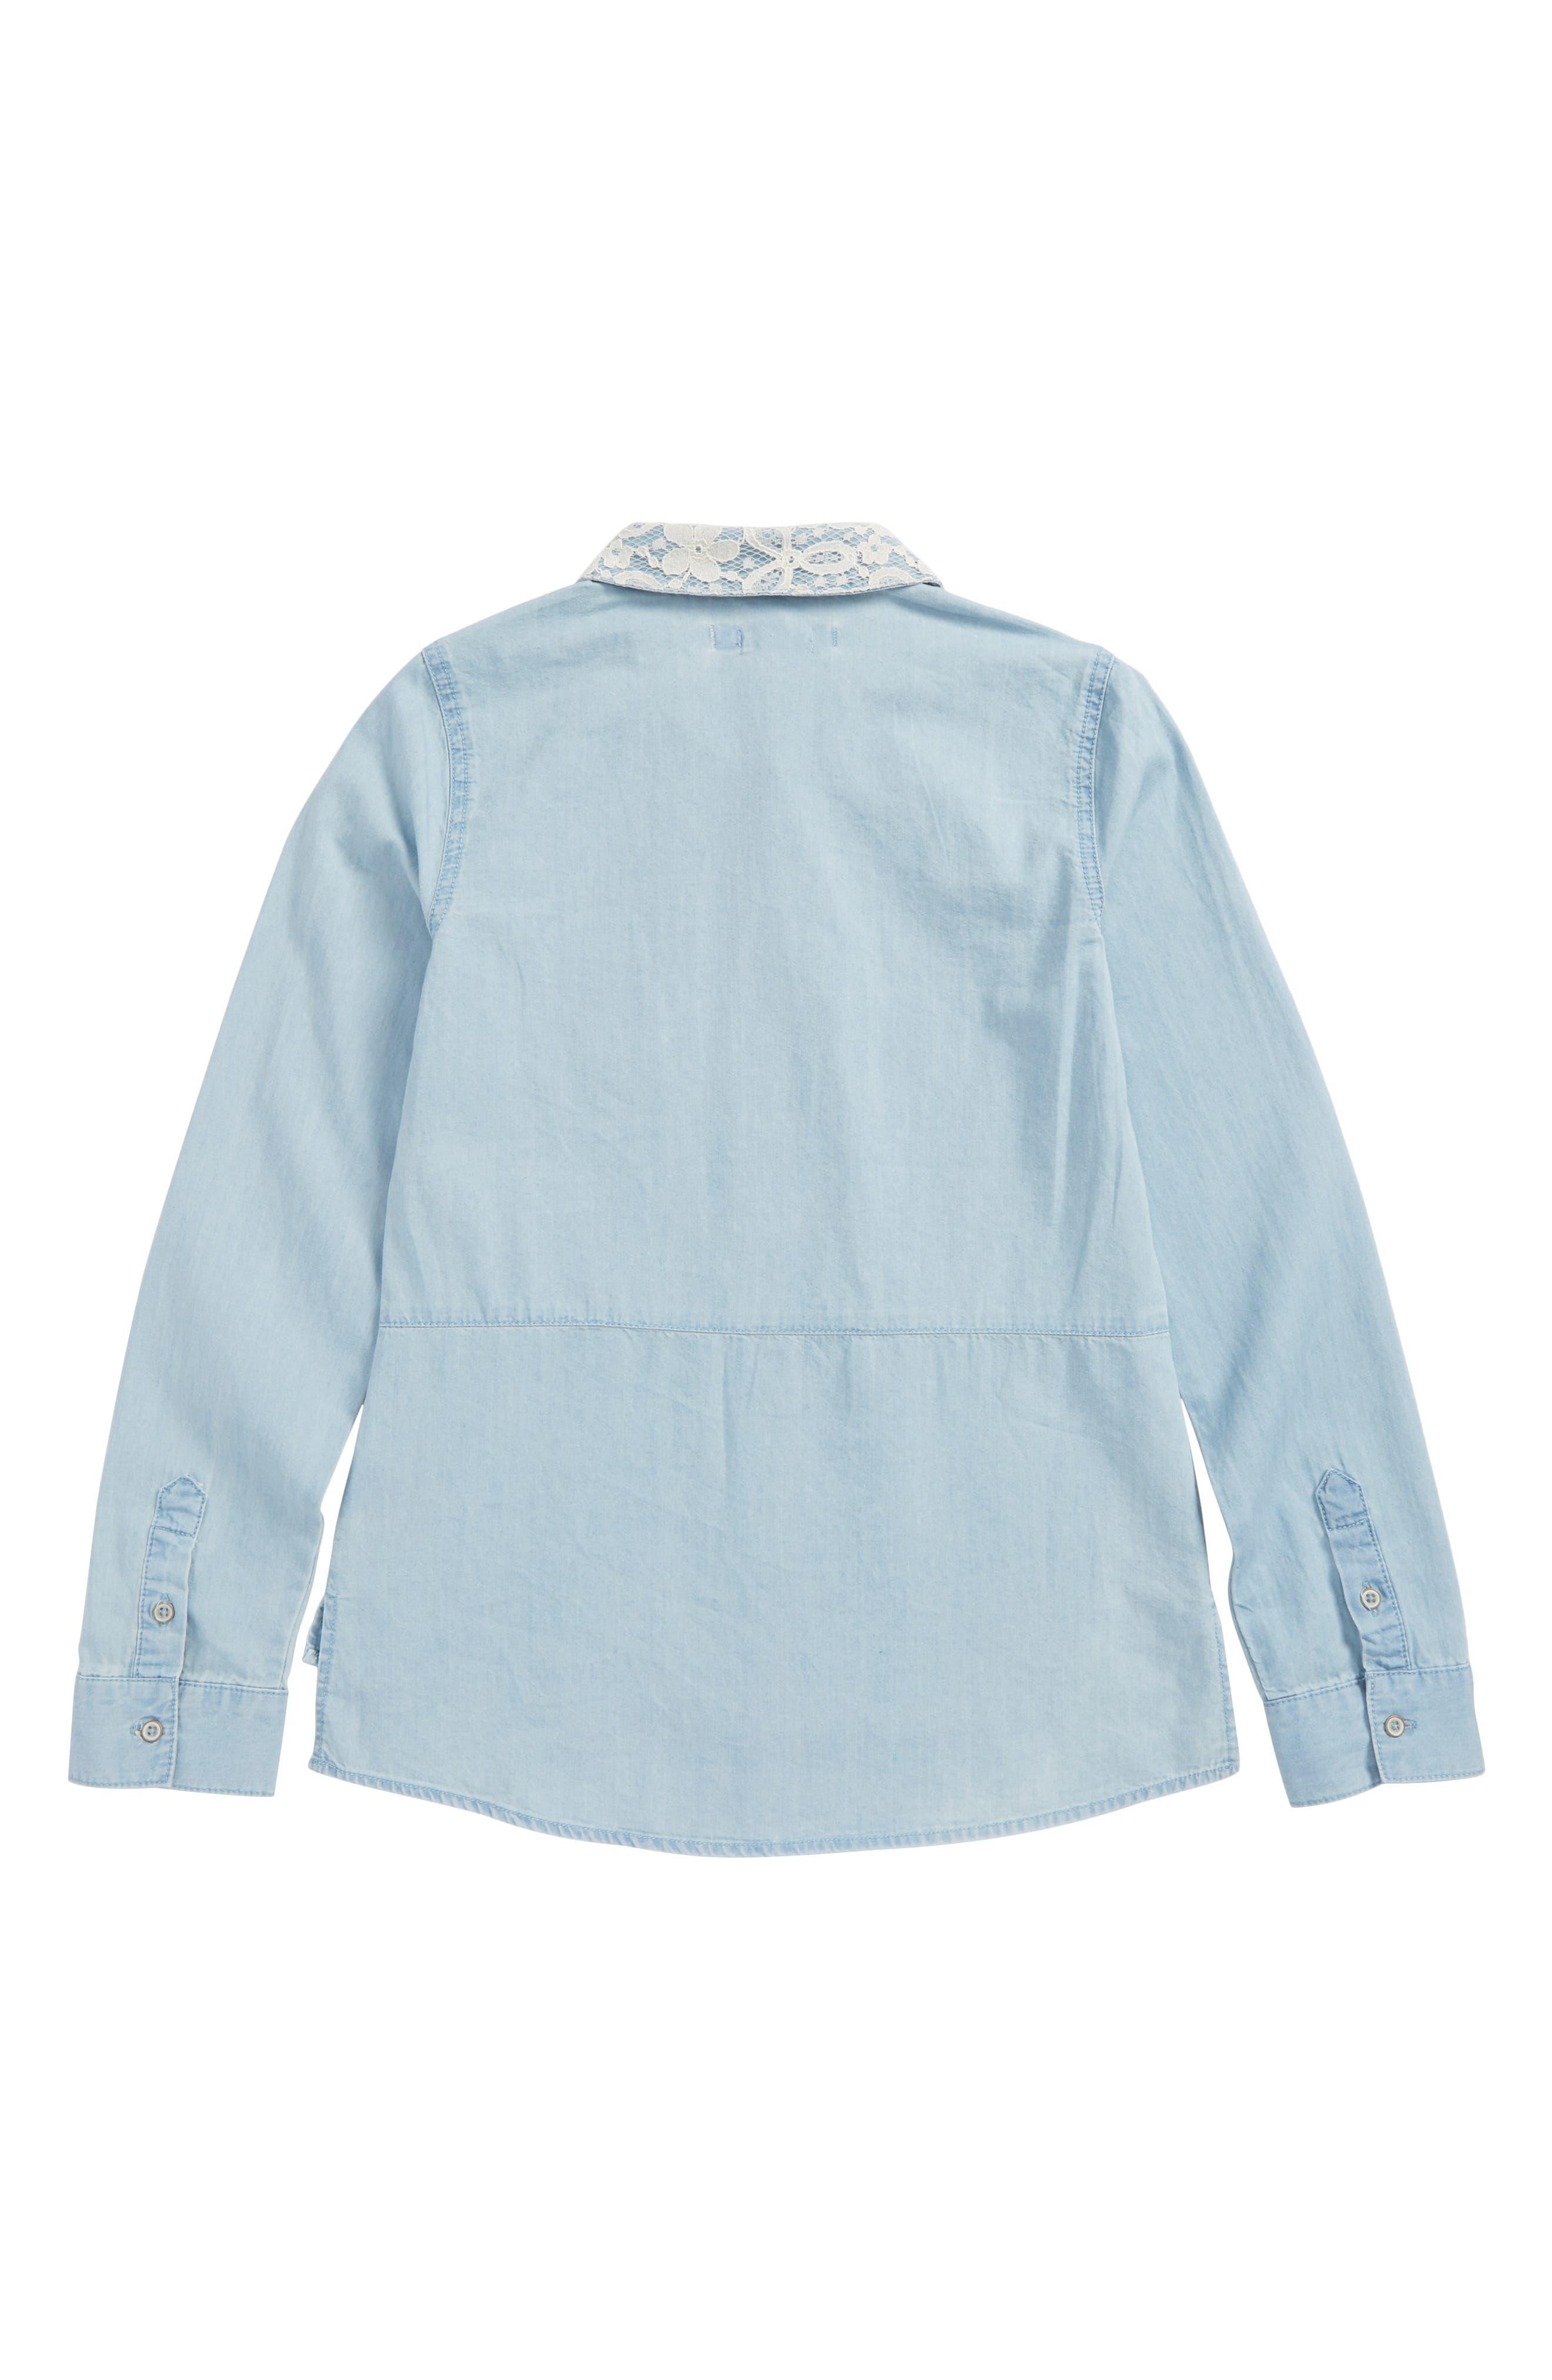 Lace Trim Chambray Shirt,                             Alternate thumbnail 2, color,                             Medium Wash